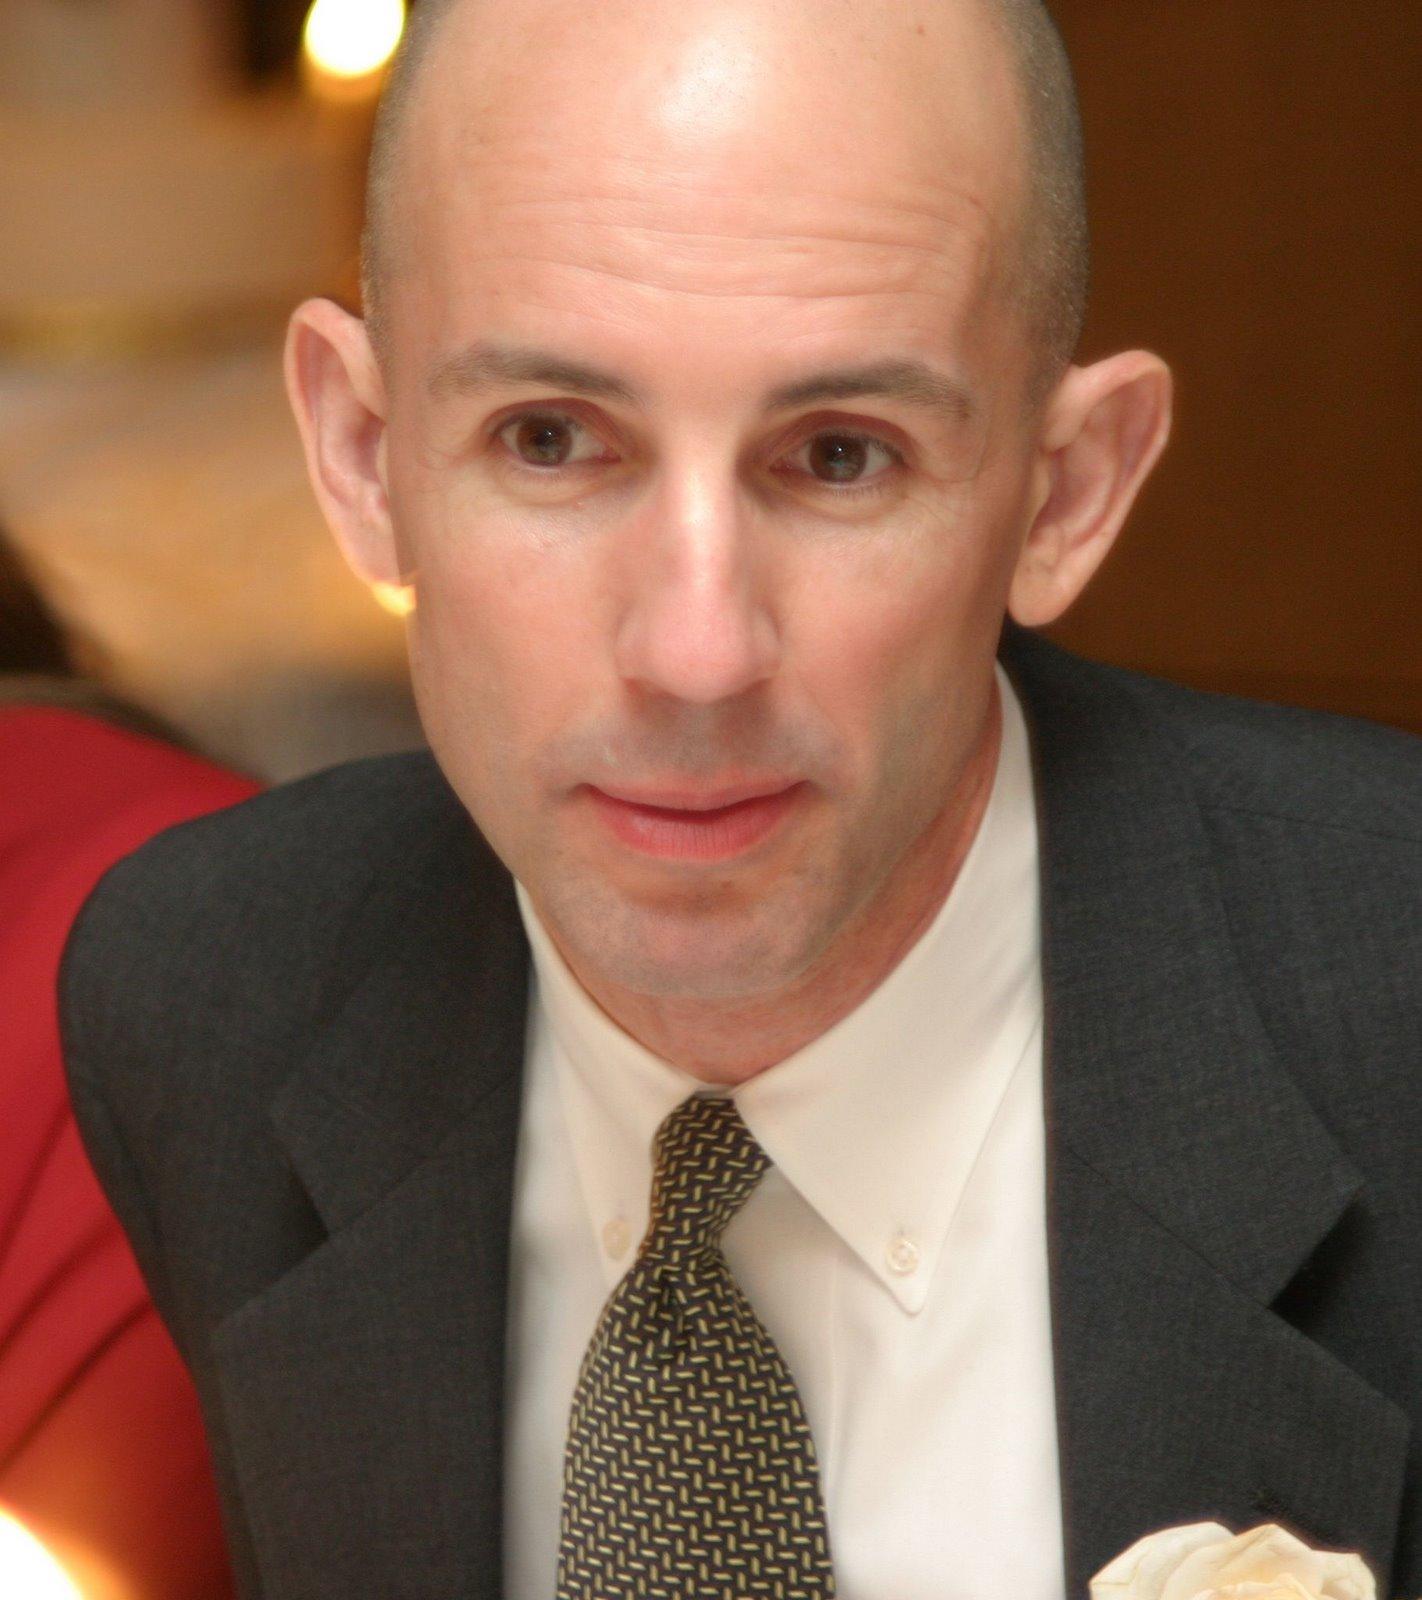 Kent Wayne Snyder, 1959-2008